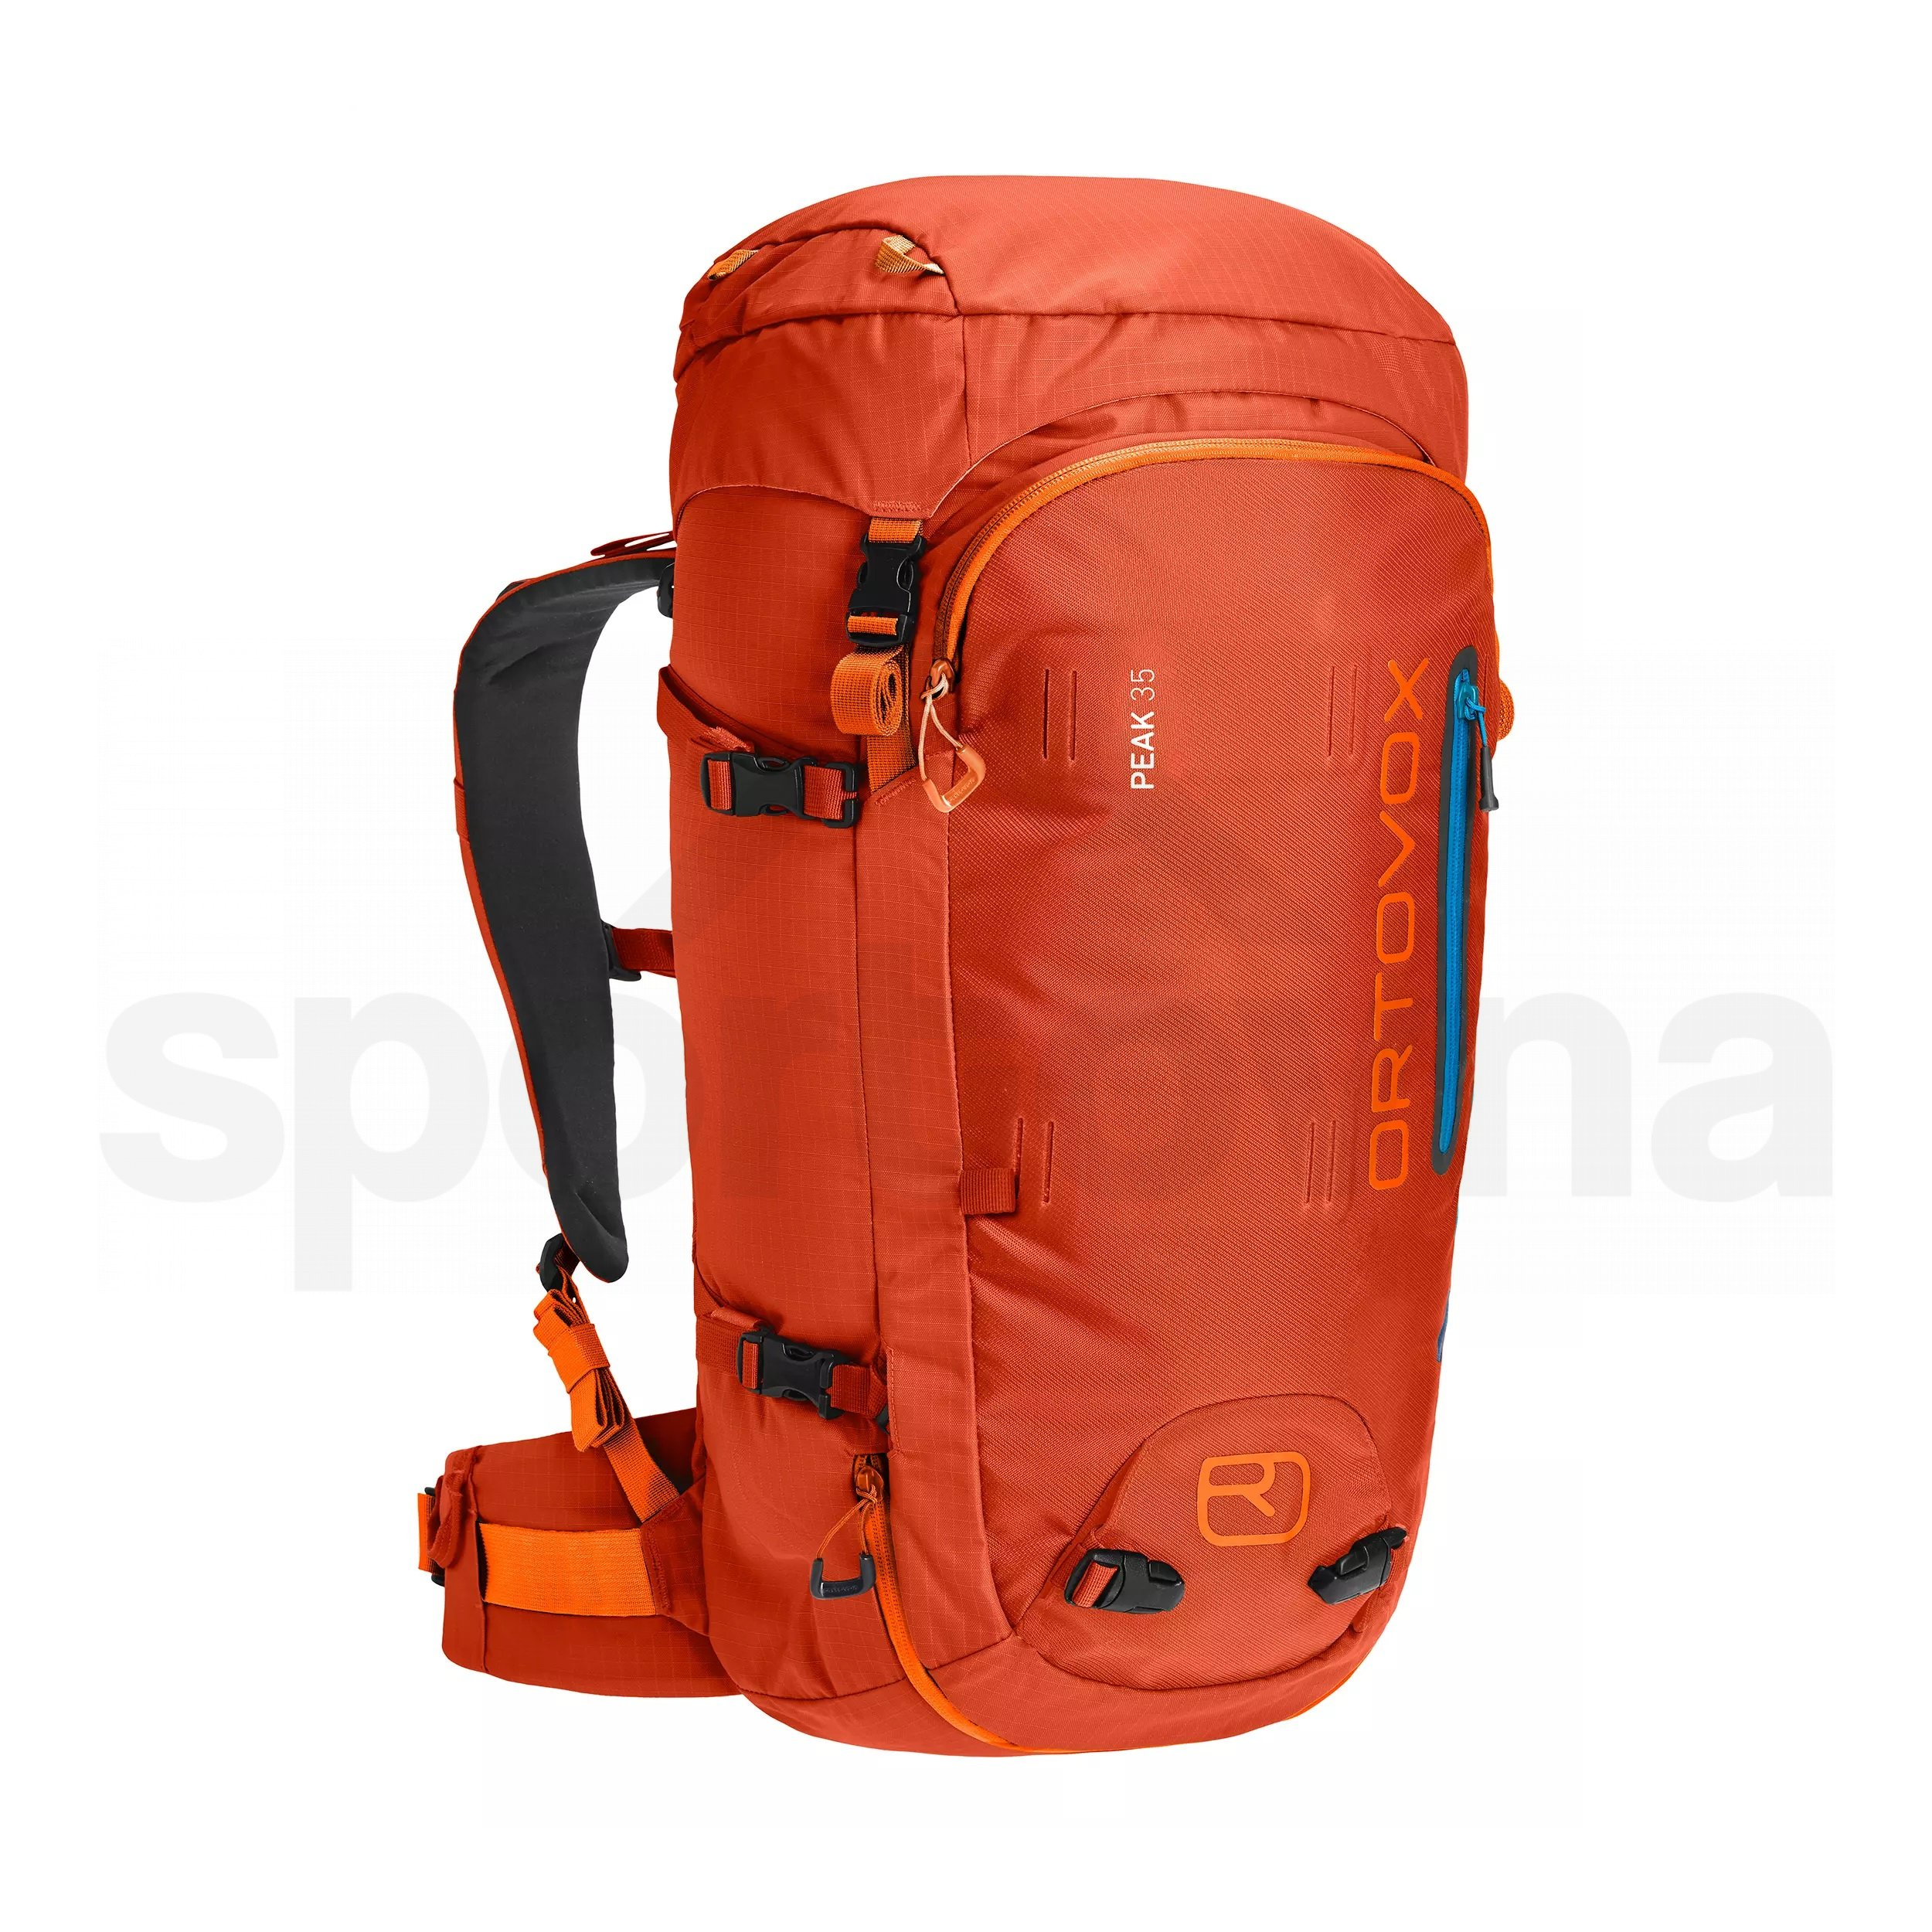 HIGH-ALPINE-PEAK-35-46251-desert-orange